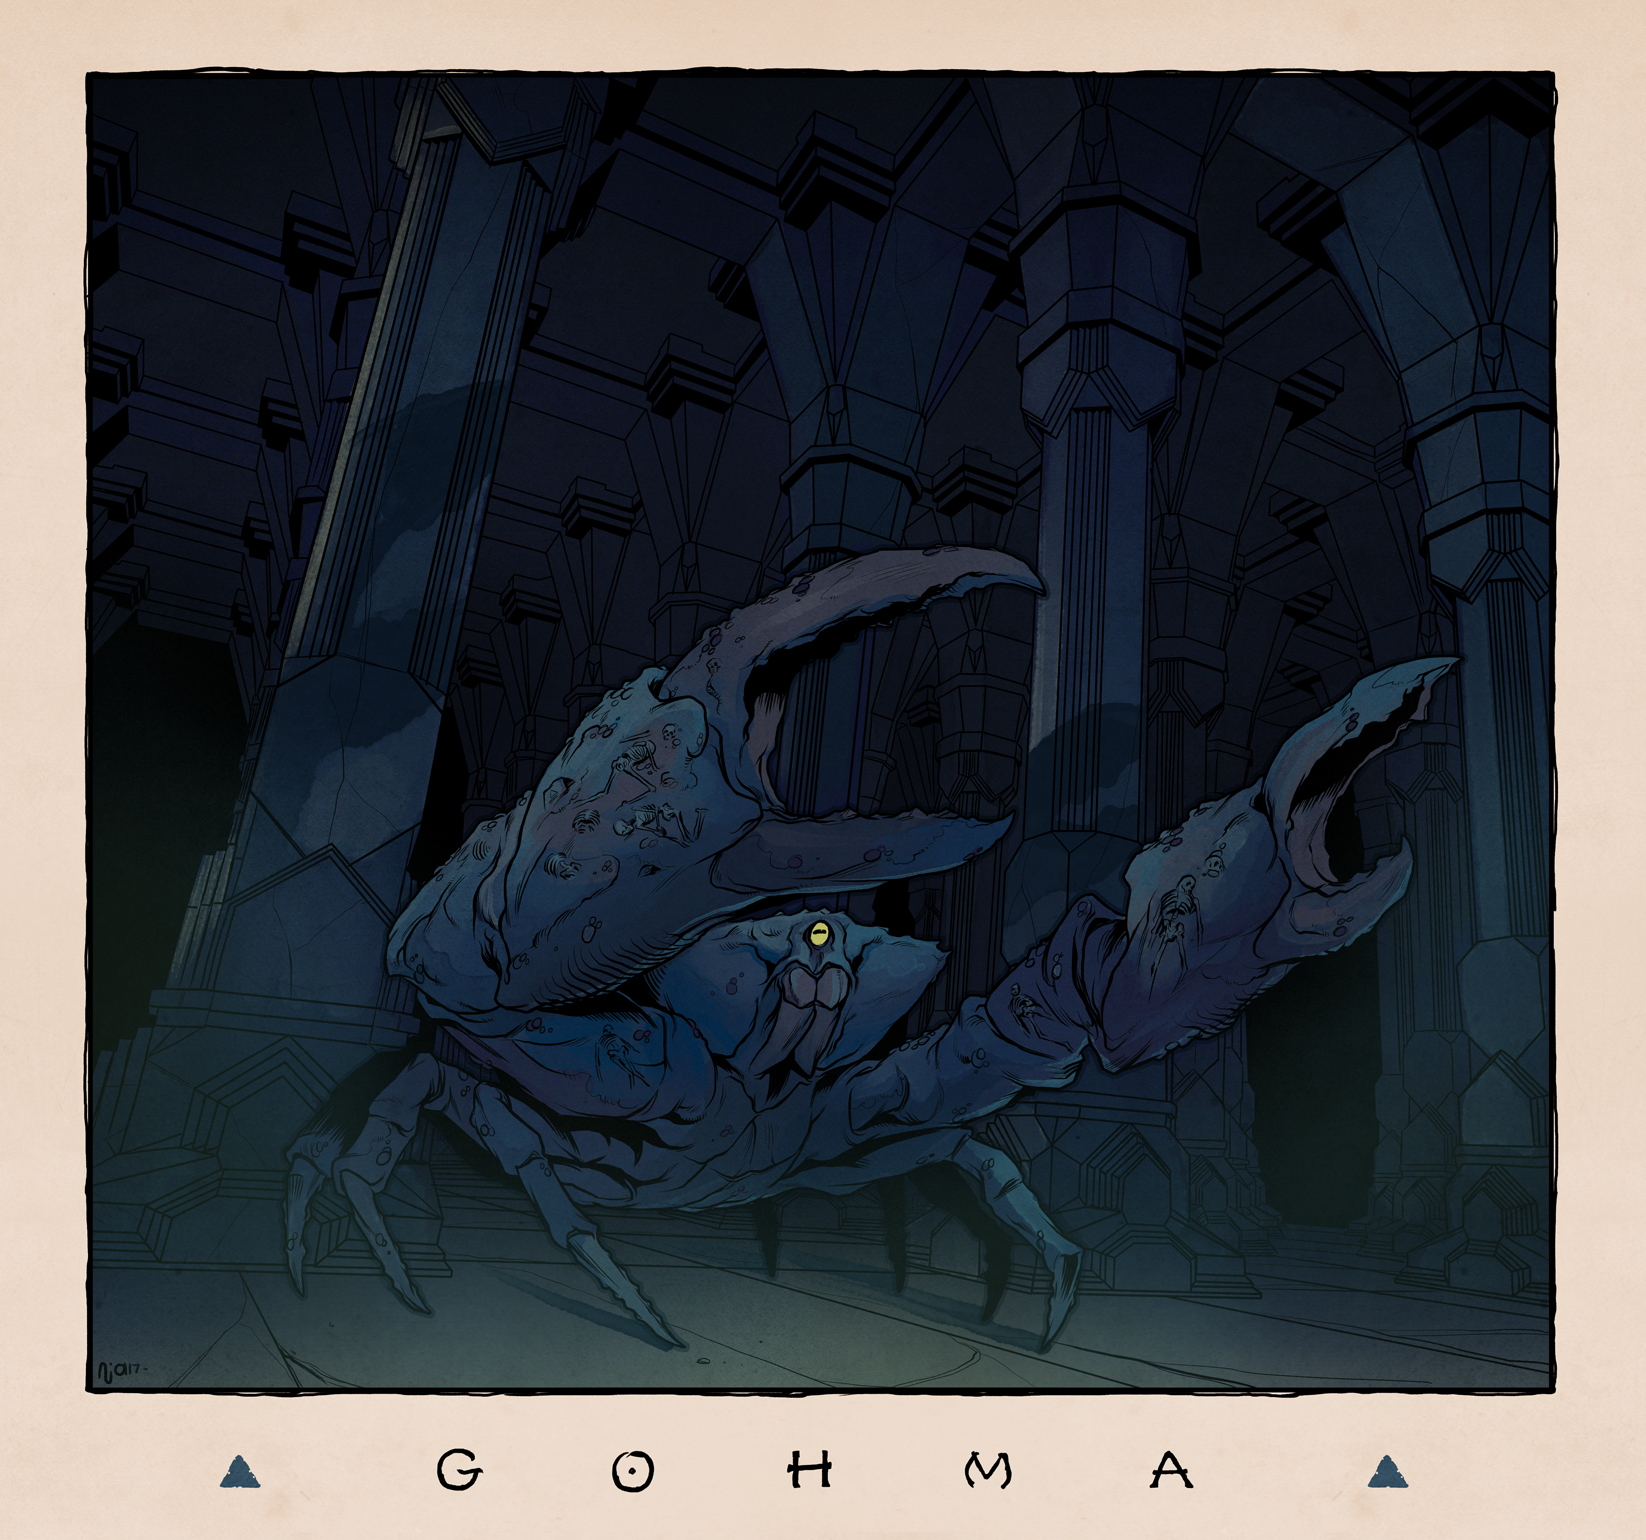 LOZ: Gohma